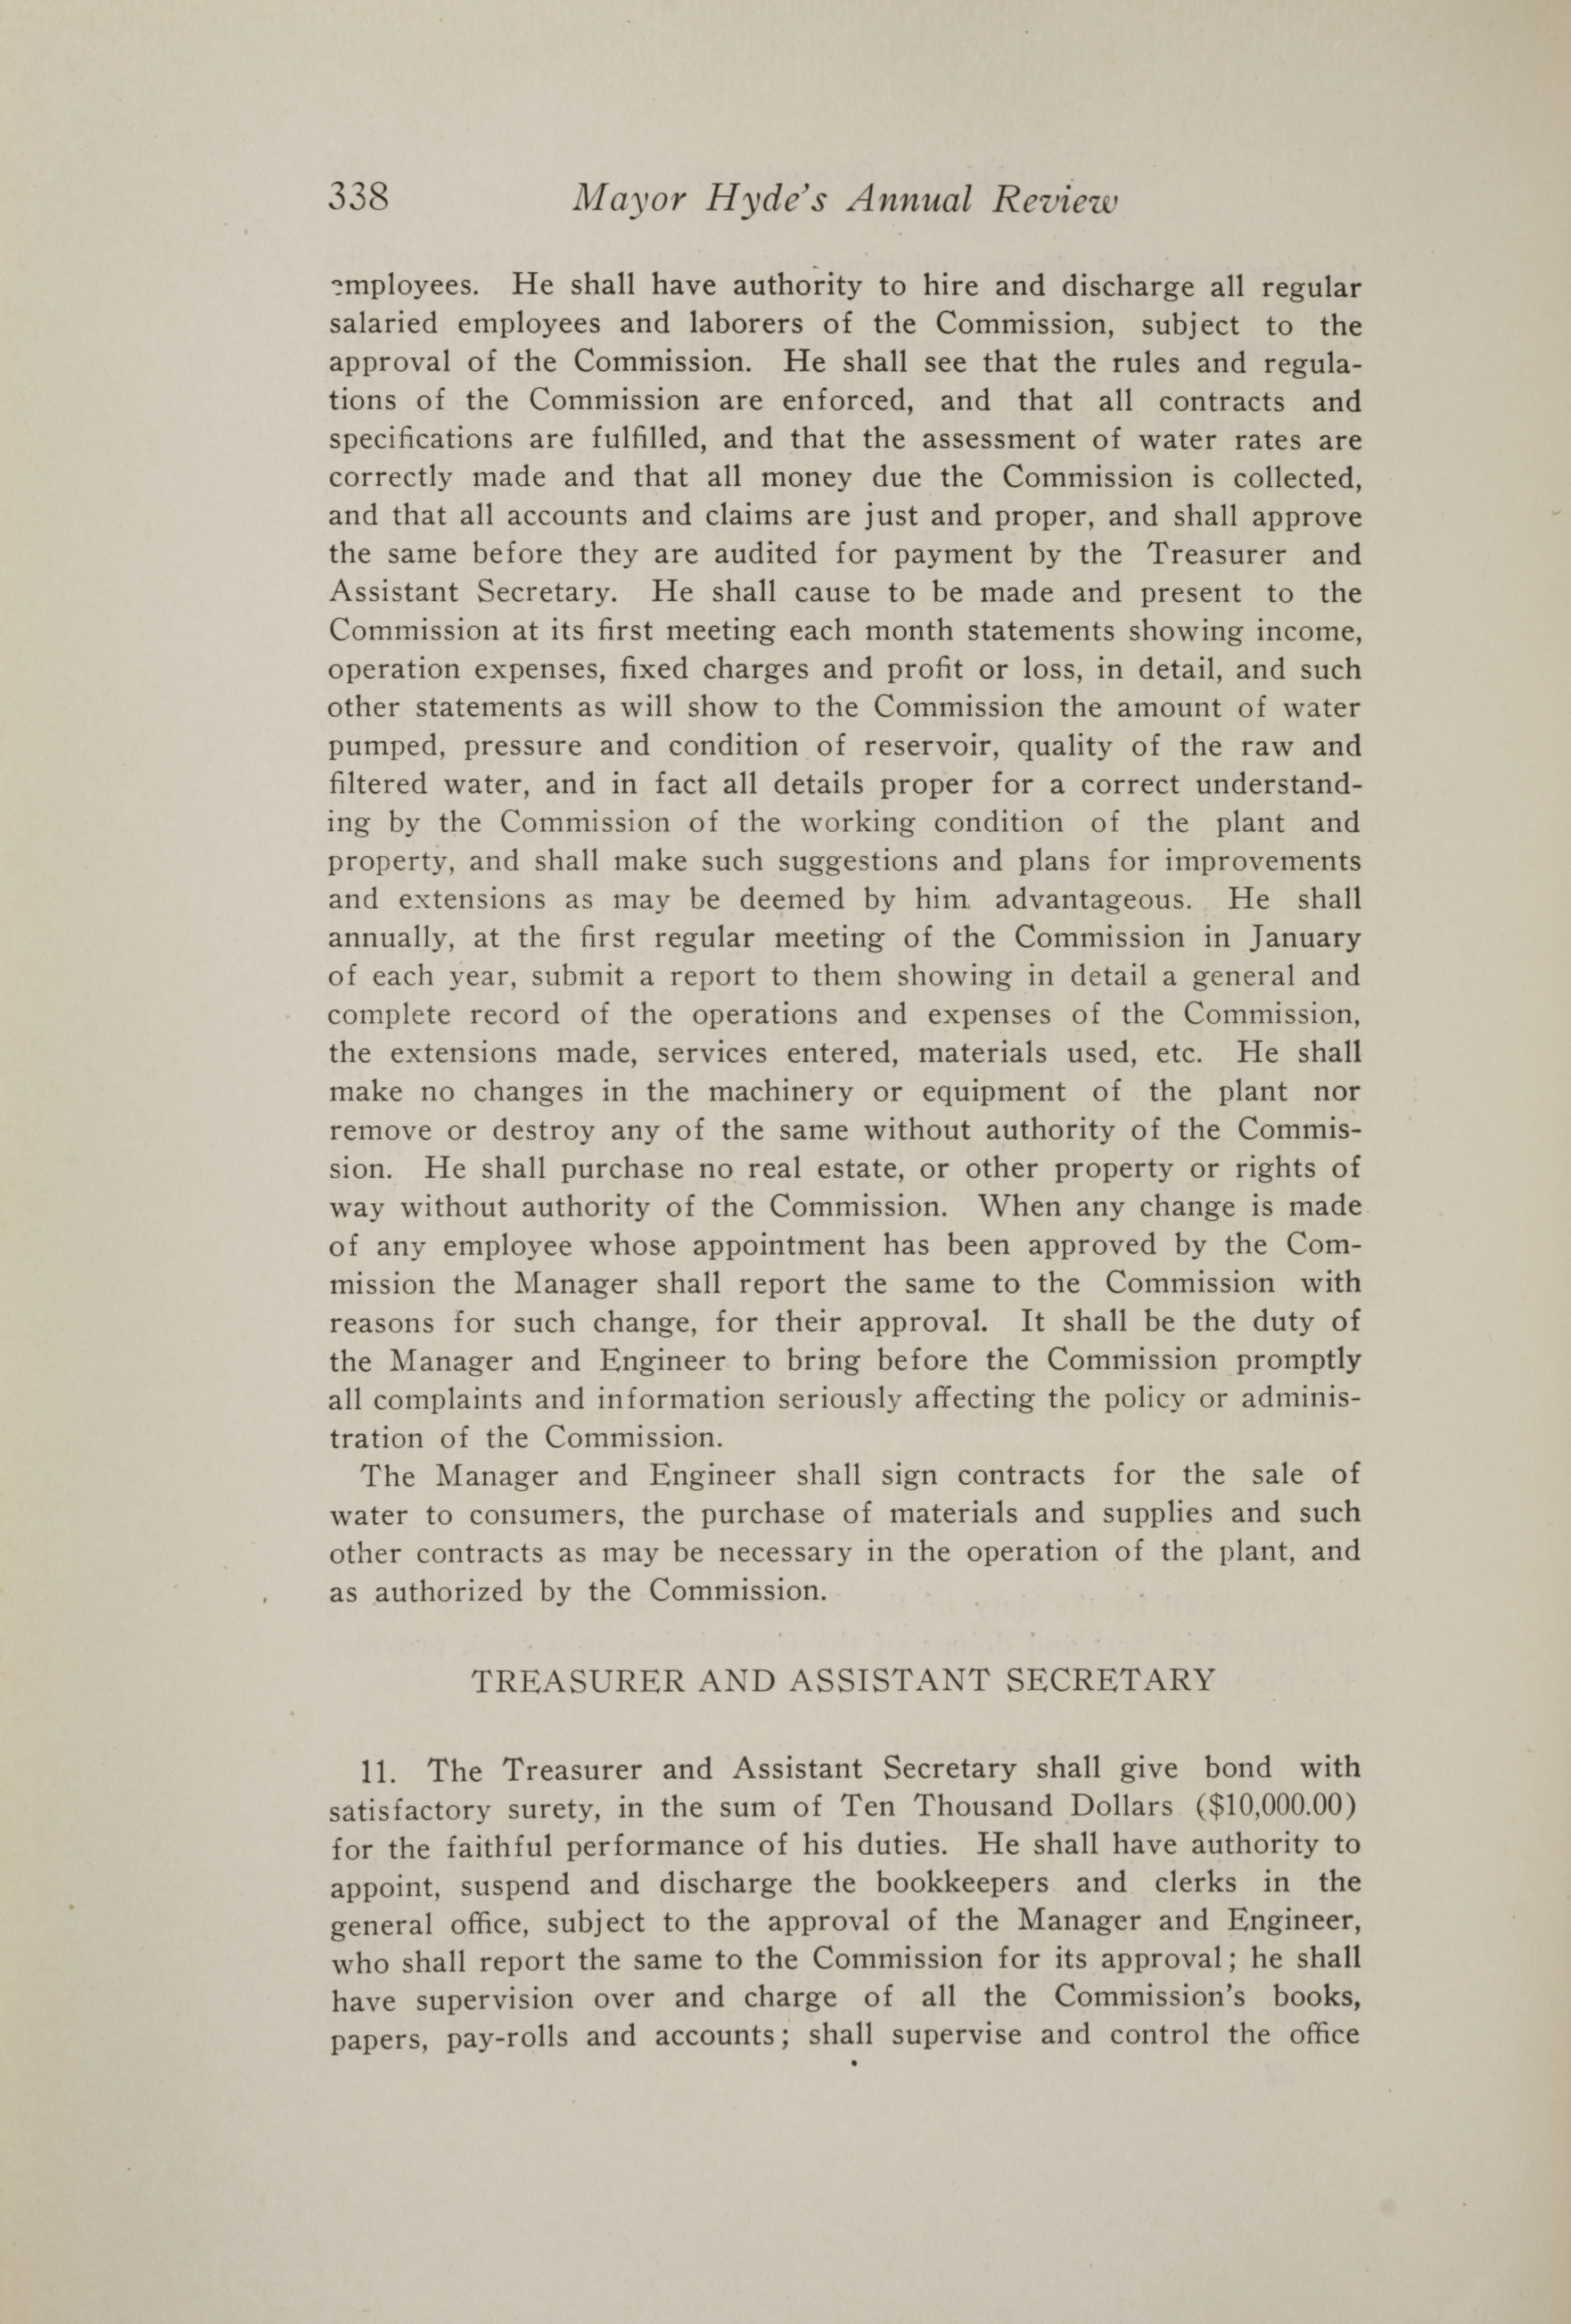 Charleston Yearbook, 1917, page 338